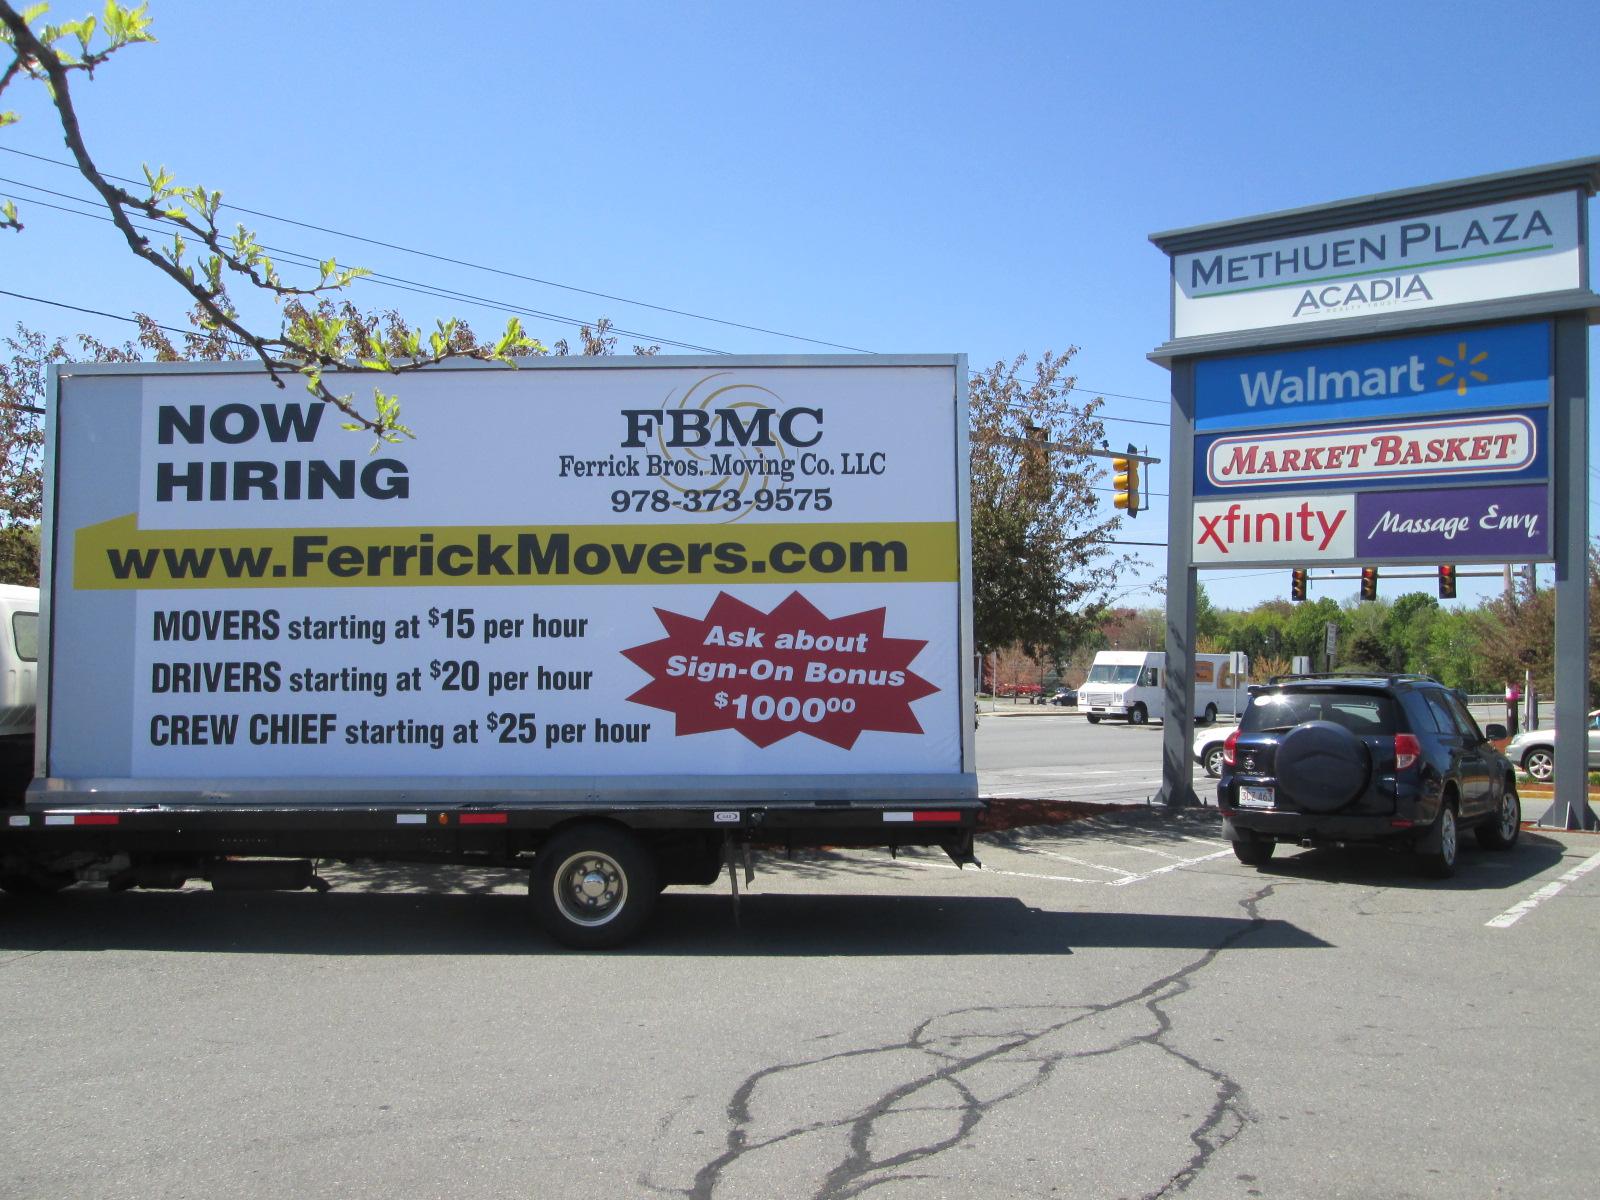 Mobile billboard truck at Methuen Plaza in Methuen MA